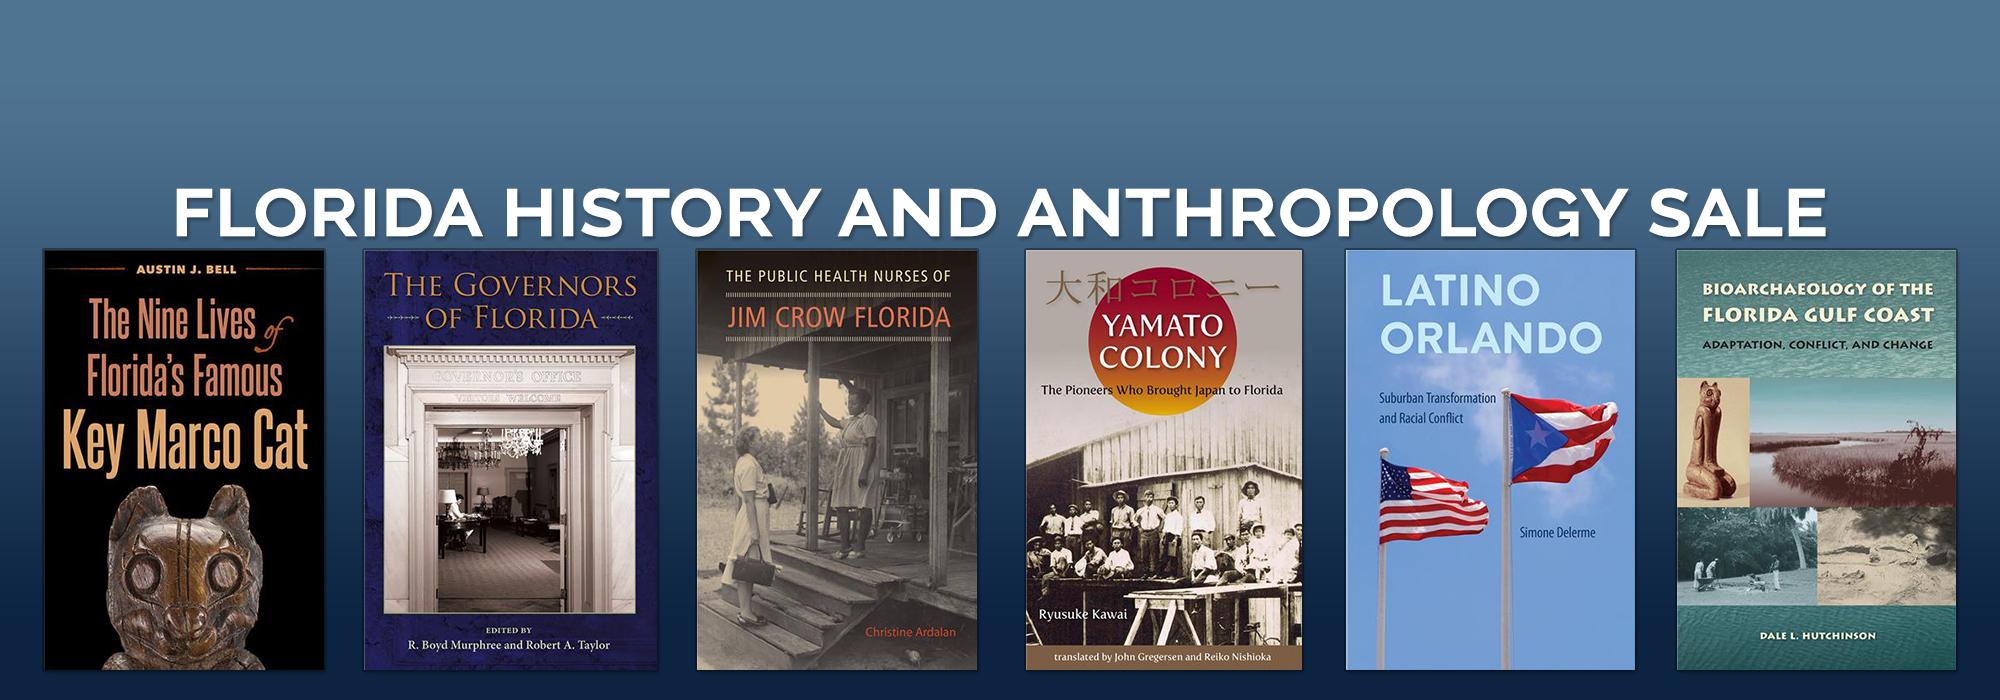 University Press of Florida